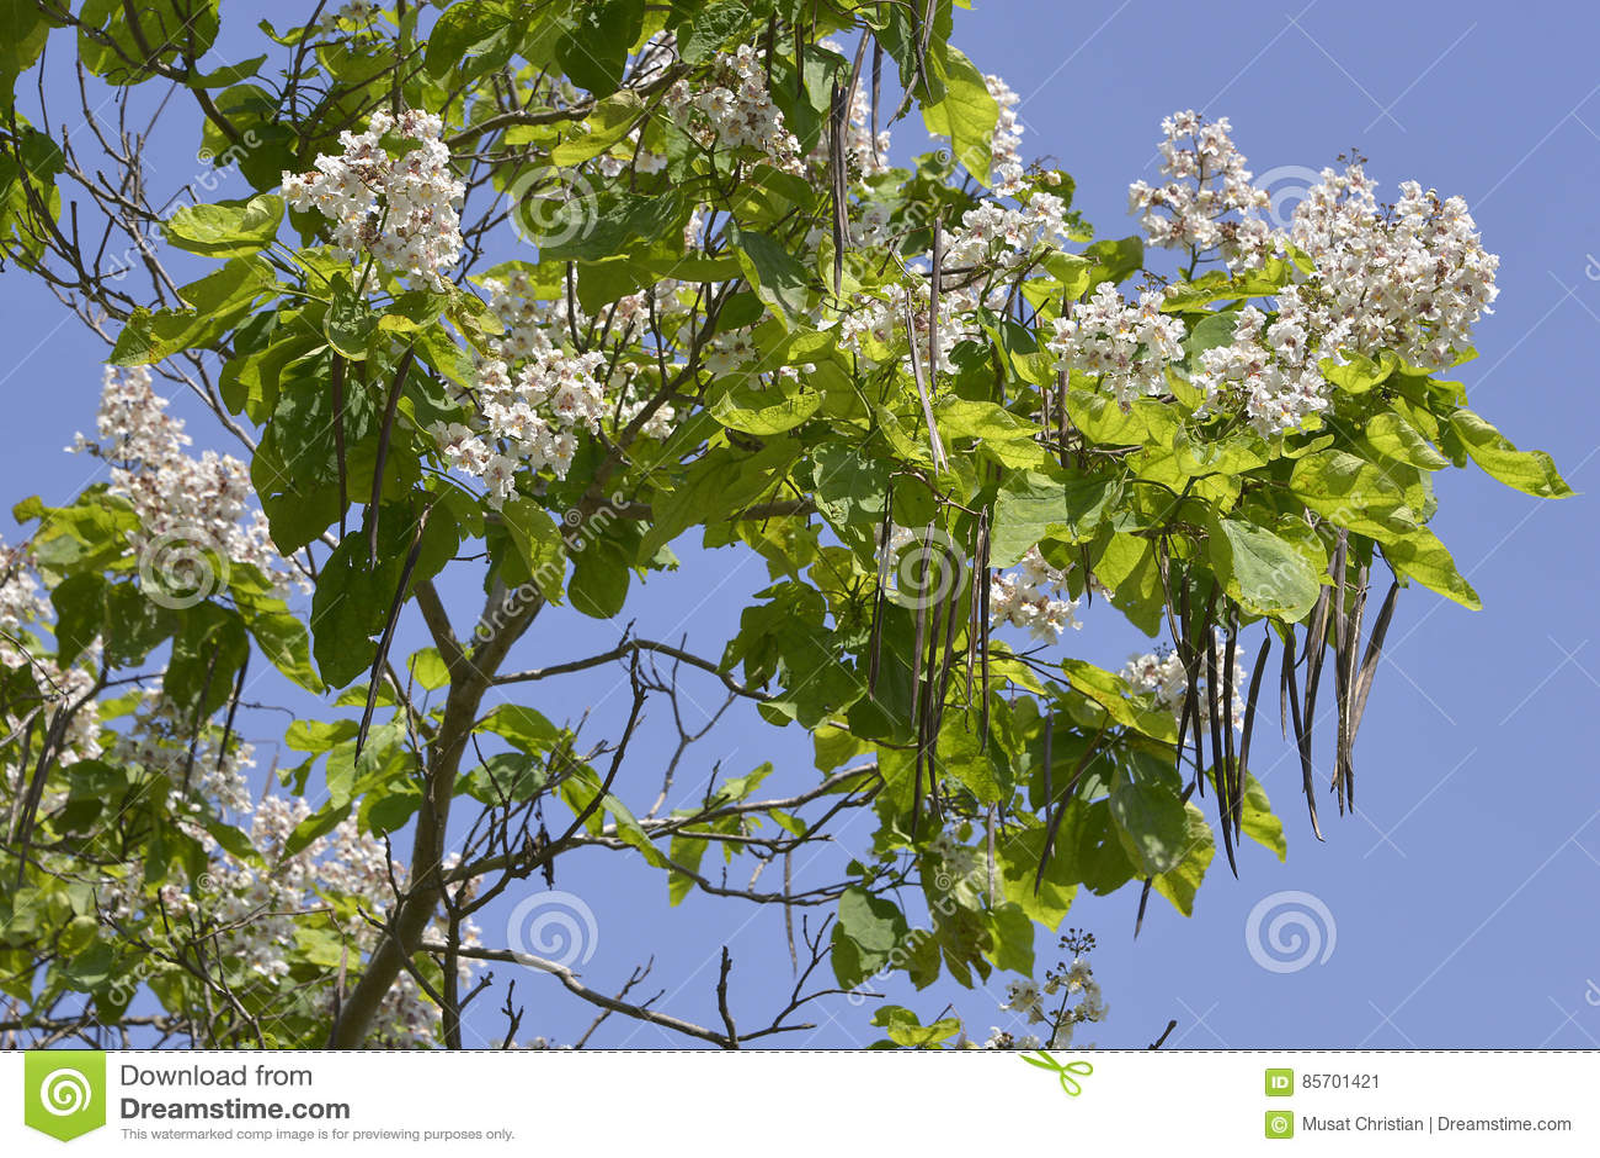 arbre de floraison de catalpa image stock image 85701421. Black Bedroom Furniture Sets. Home Design Ideas